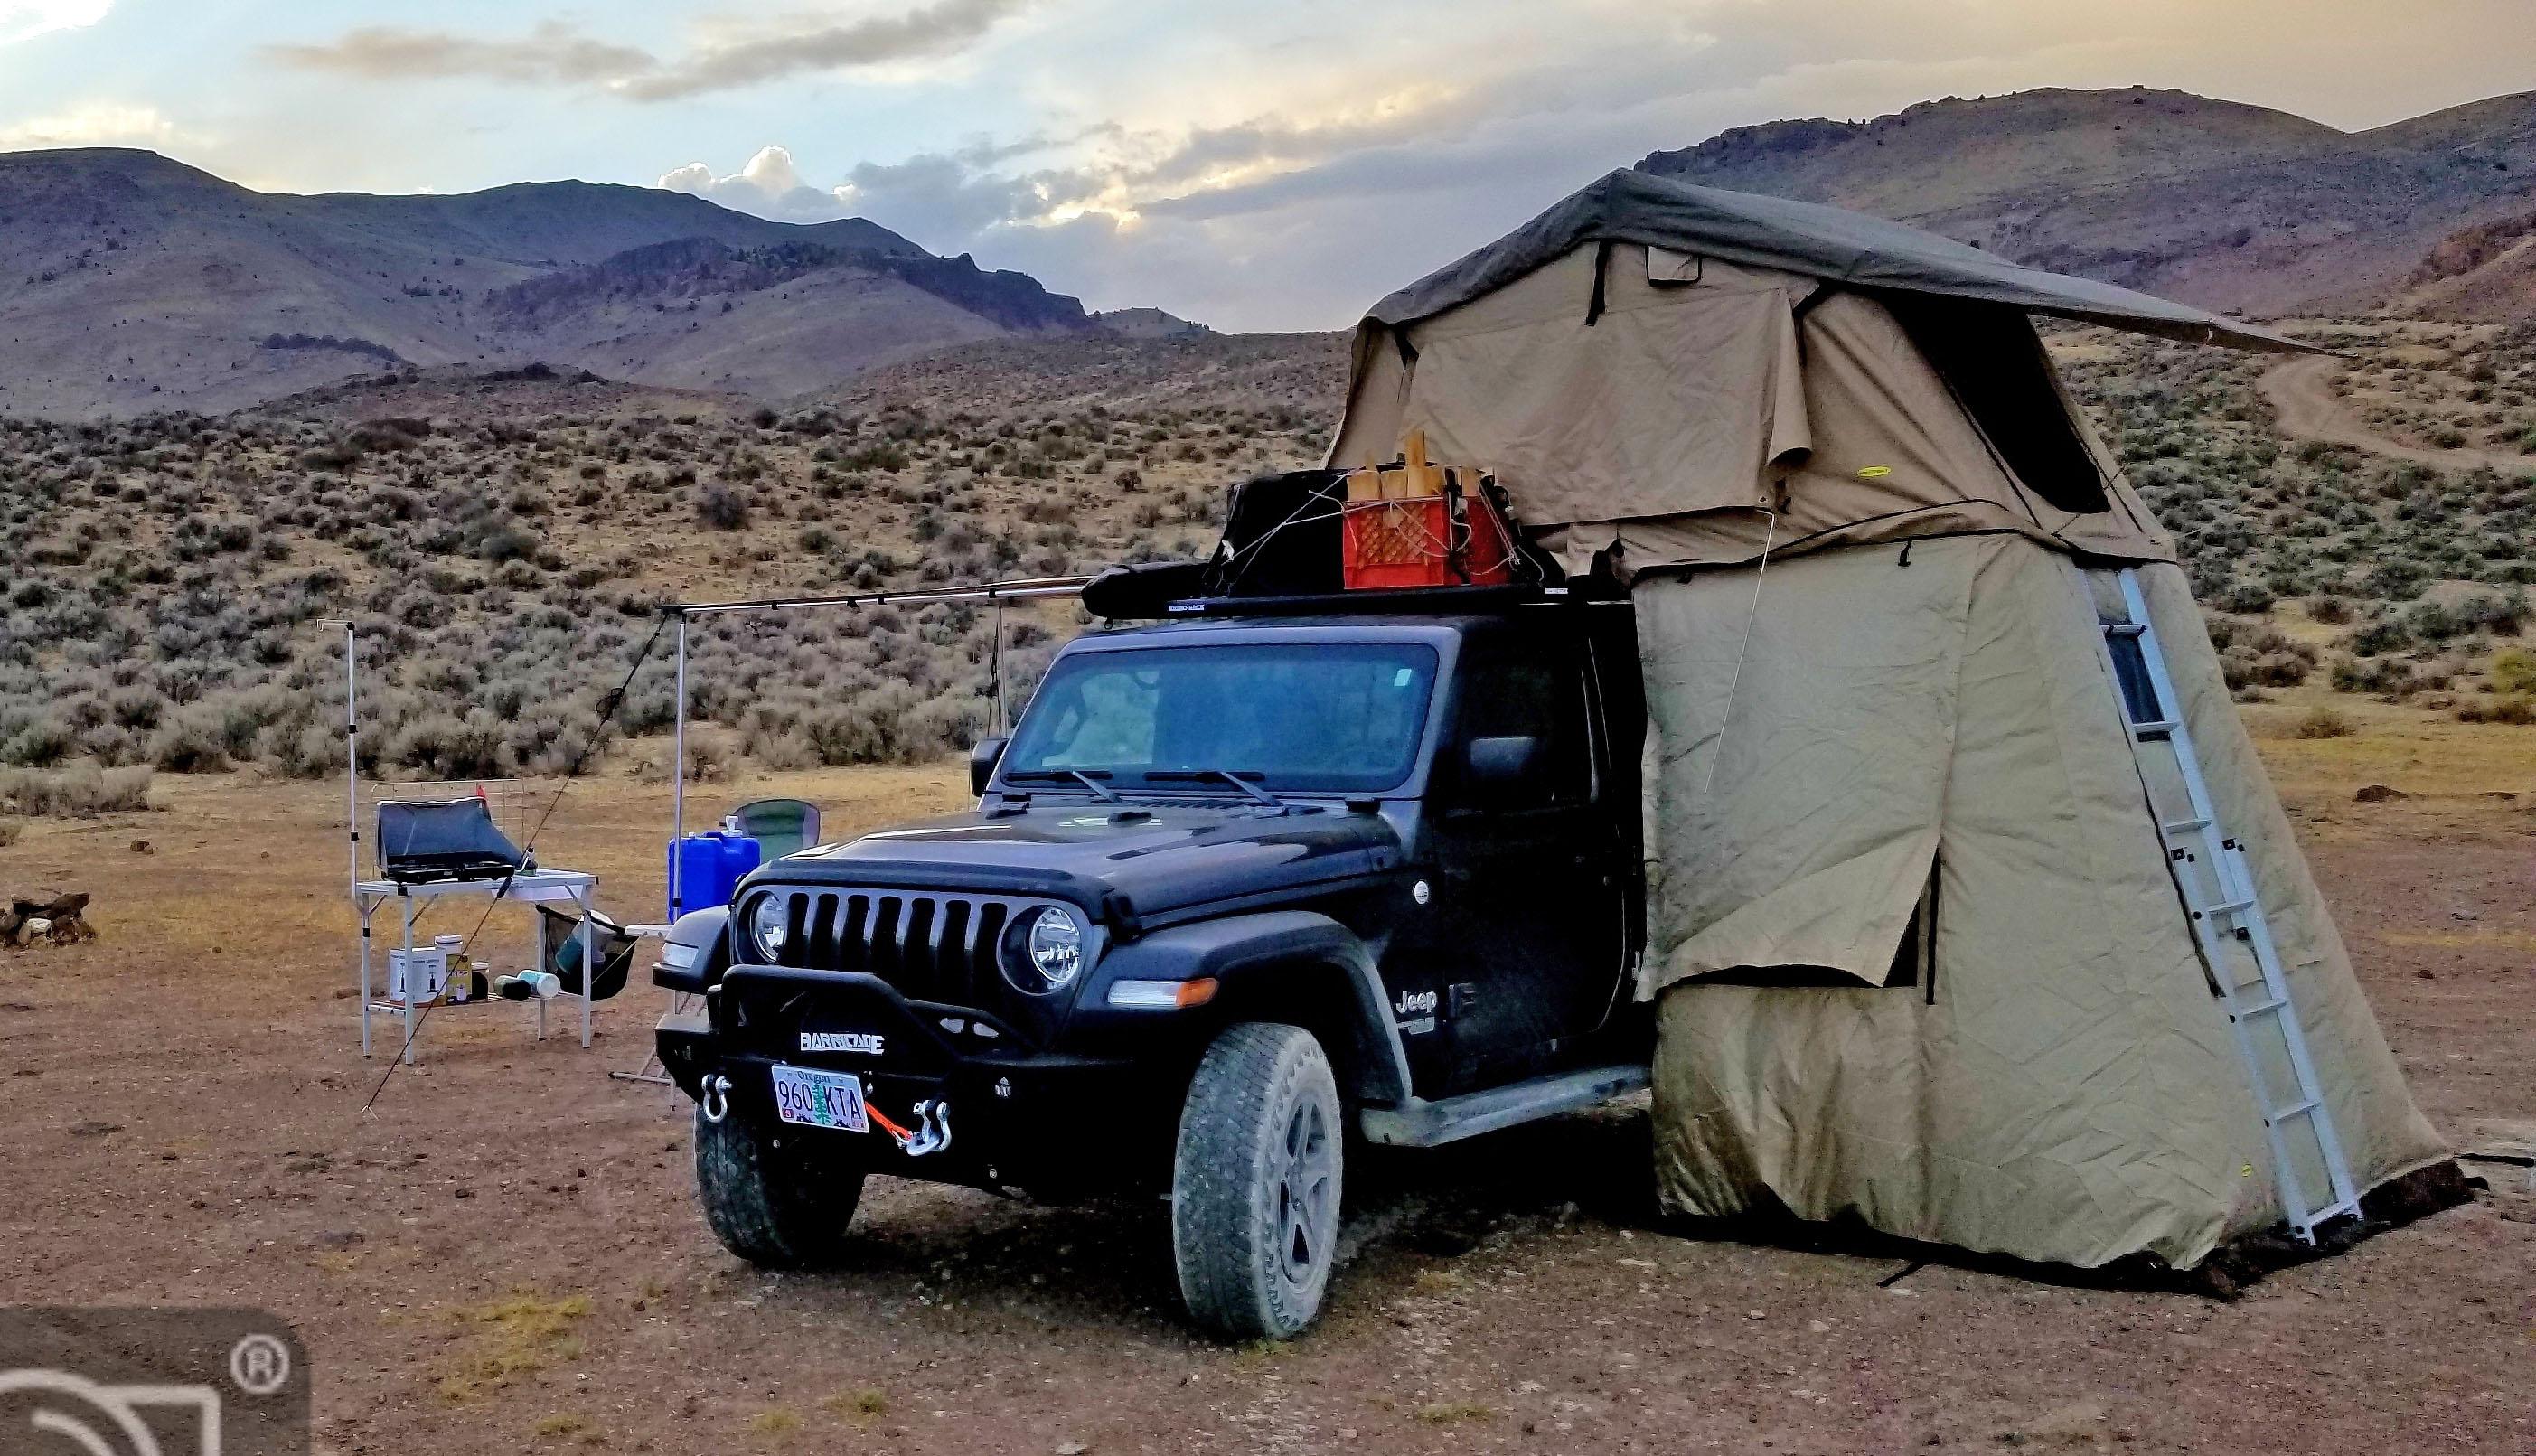 Trav S Overlanding Sport Build 2018 Jeep Wrangler Jl